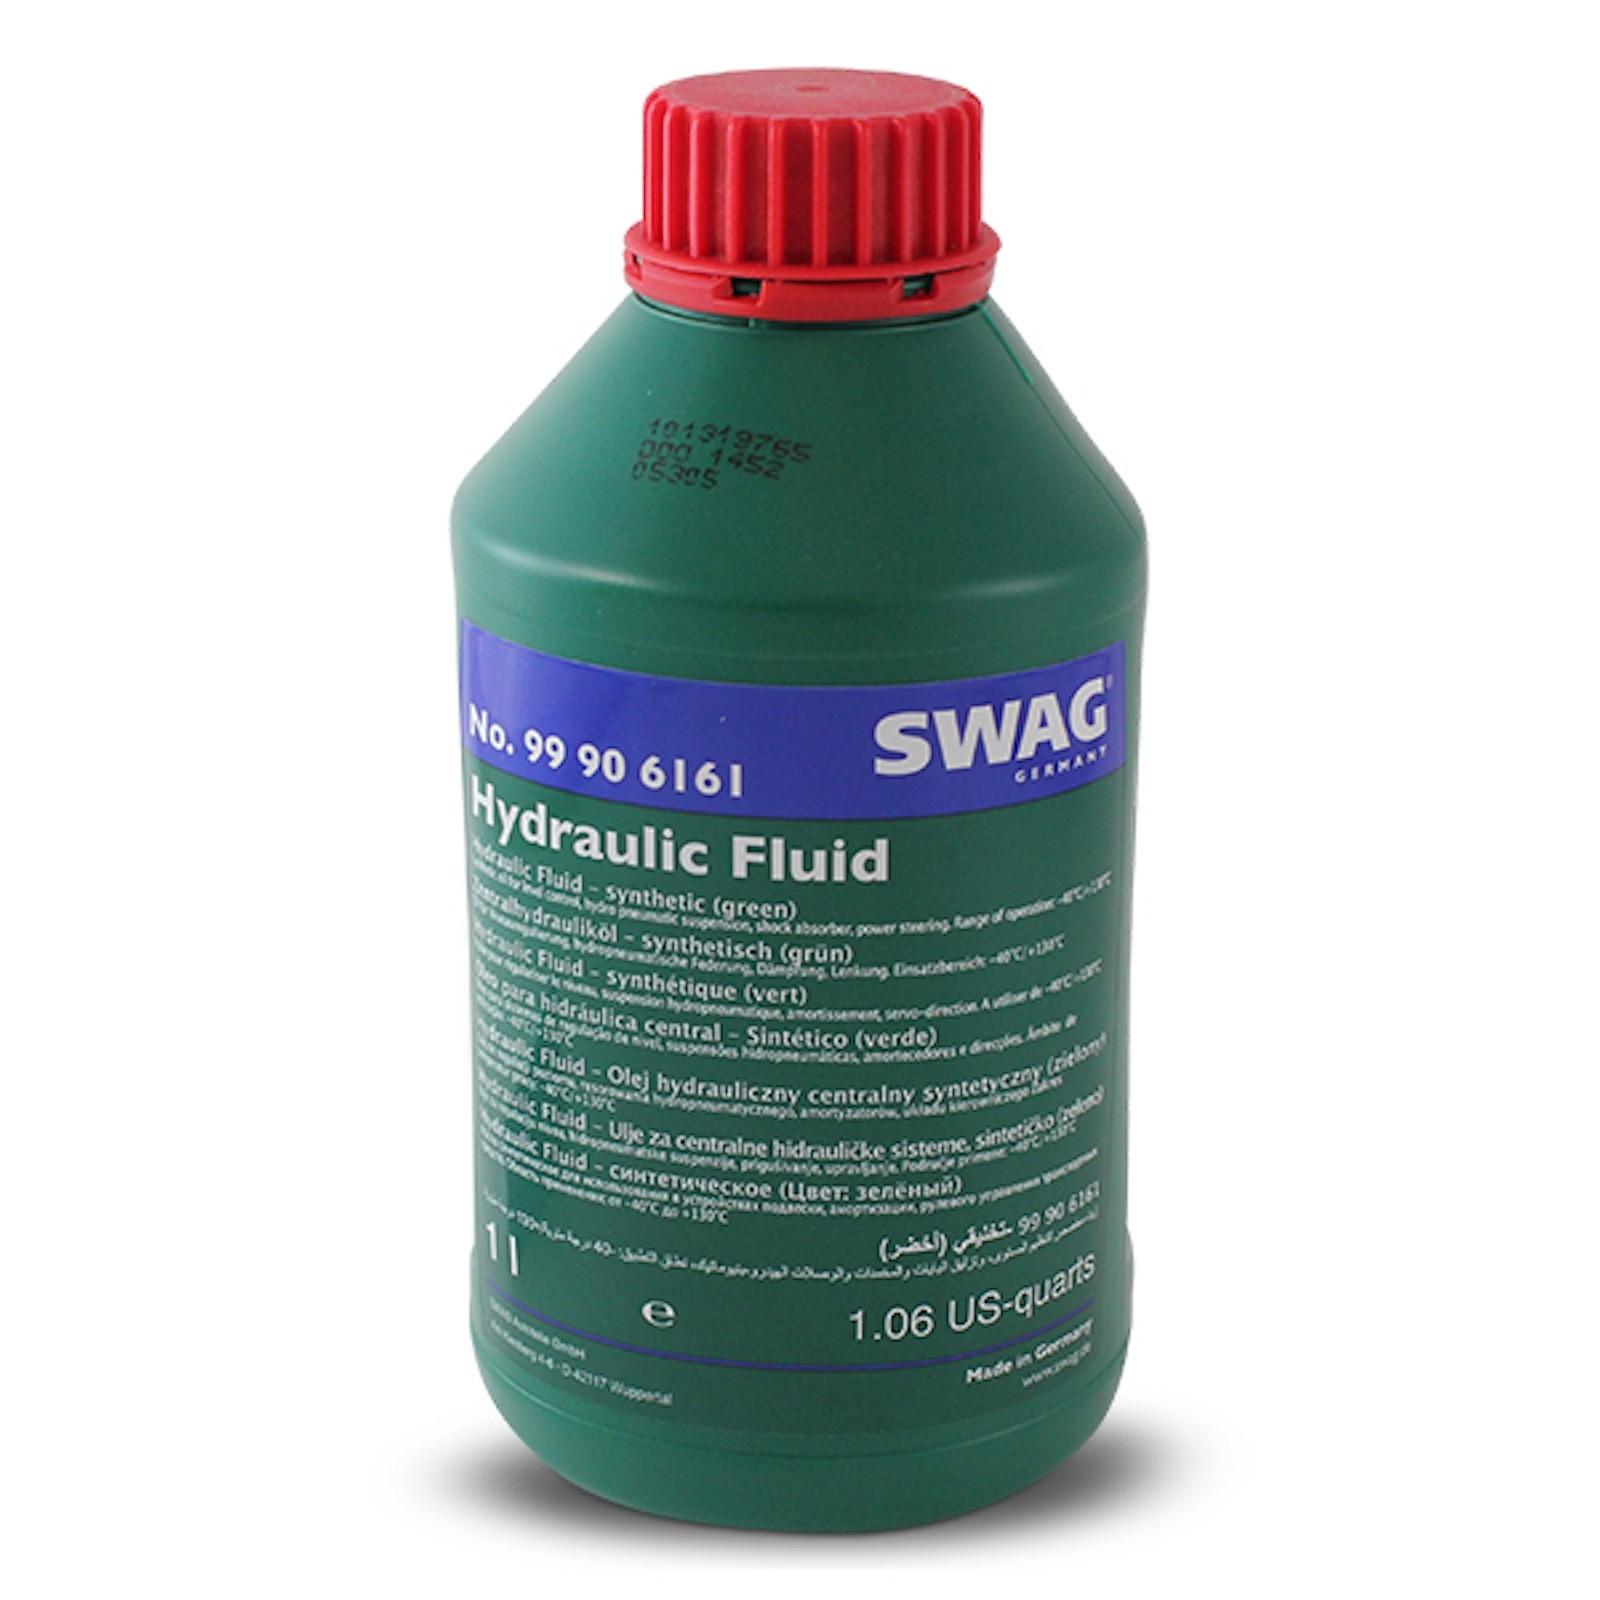 power steering hydraulic fluid oil chf 11s pentosin green audi vw bmw mercedes ebay details about power steering hydraulic fluid oil chf 11s pentosin green audi vw bmw mercedes